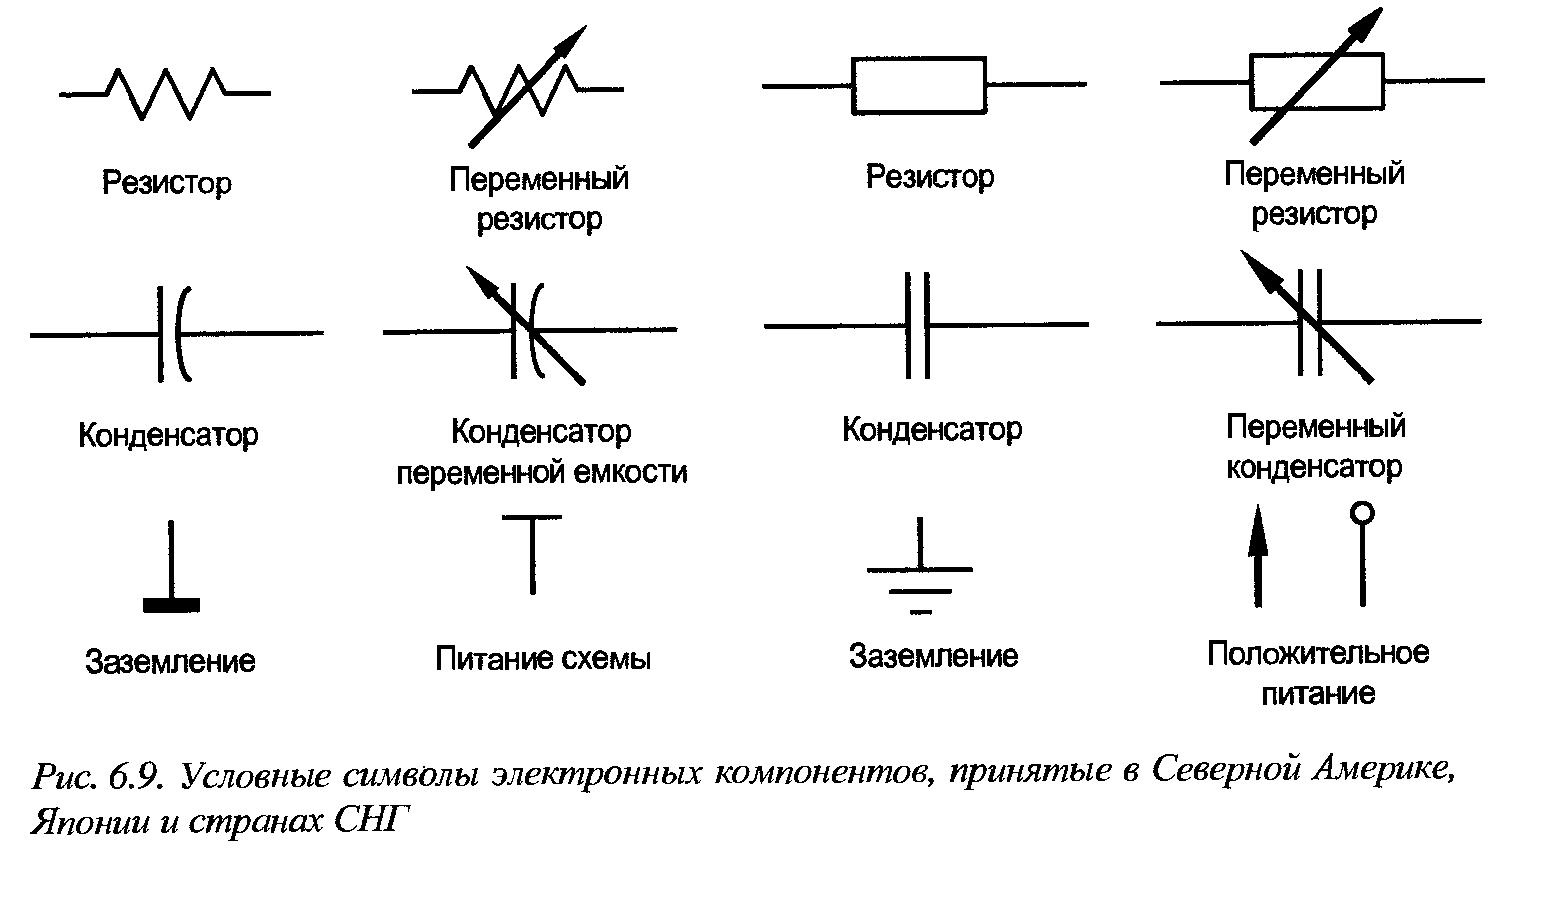 обозначение на схеме автоматизации насоса